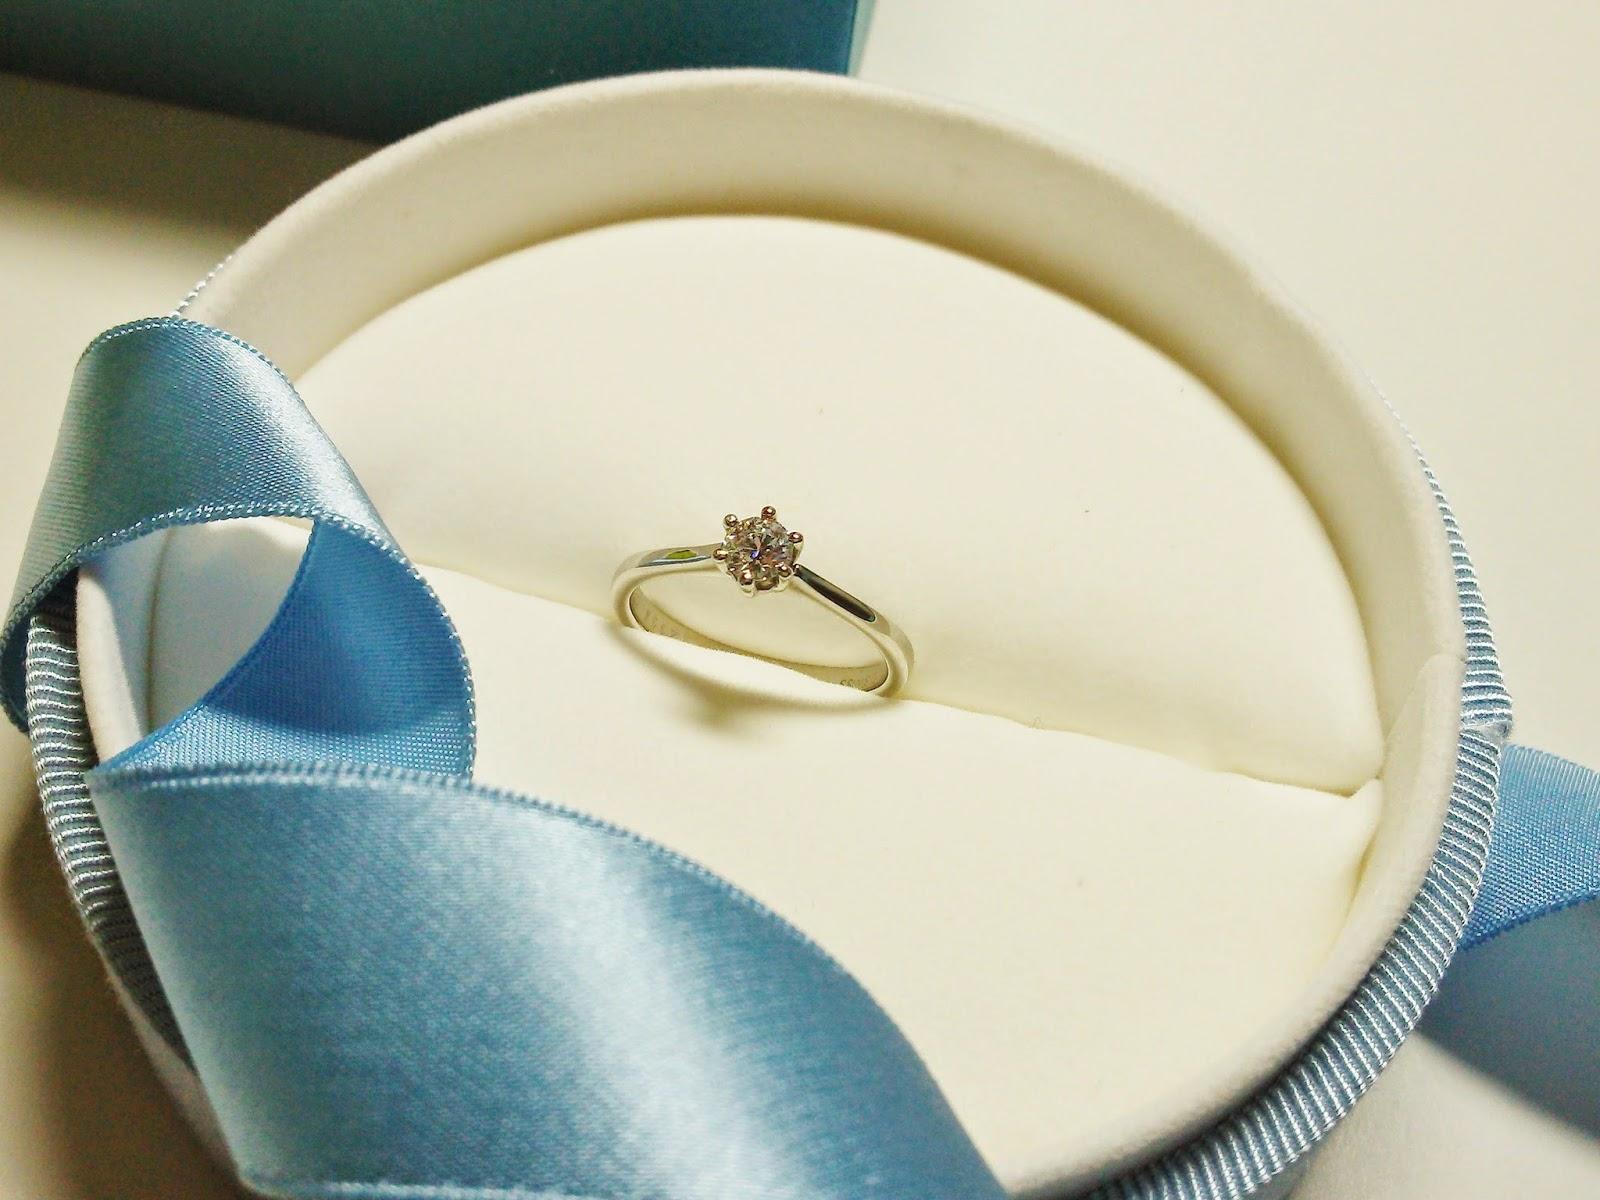 FURRER JACOT フラージャコー ギャラリー 名古屋 婚約指輪 エンゲージリング プロポーズ シンプル